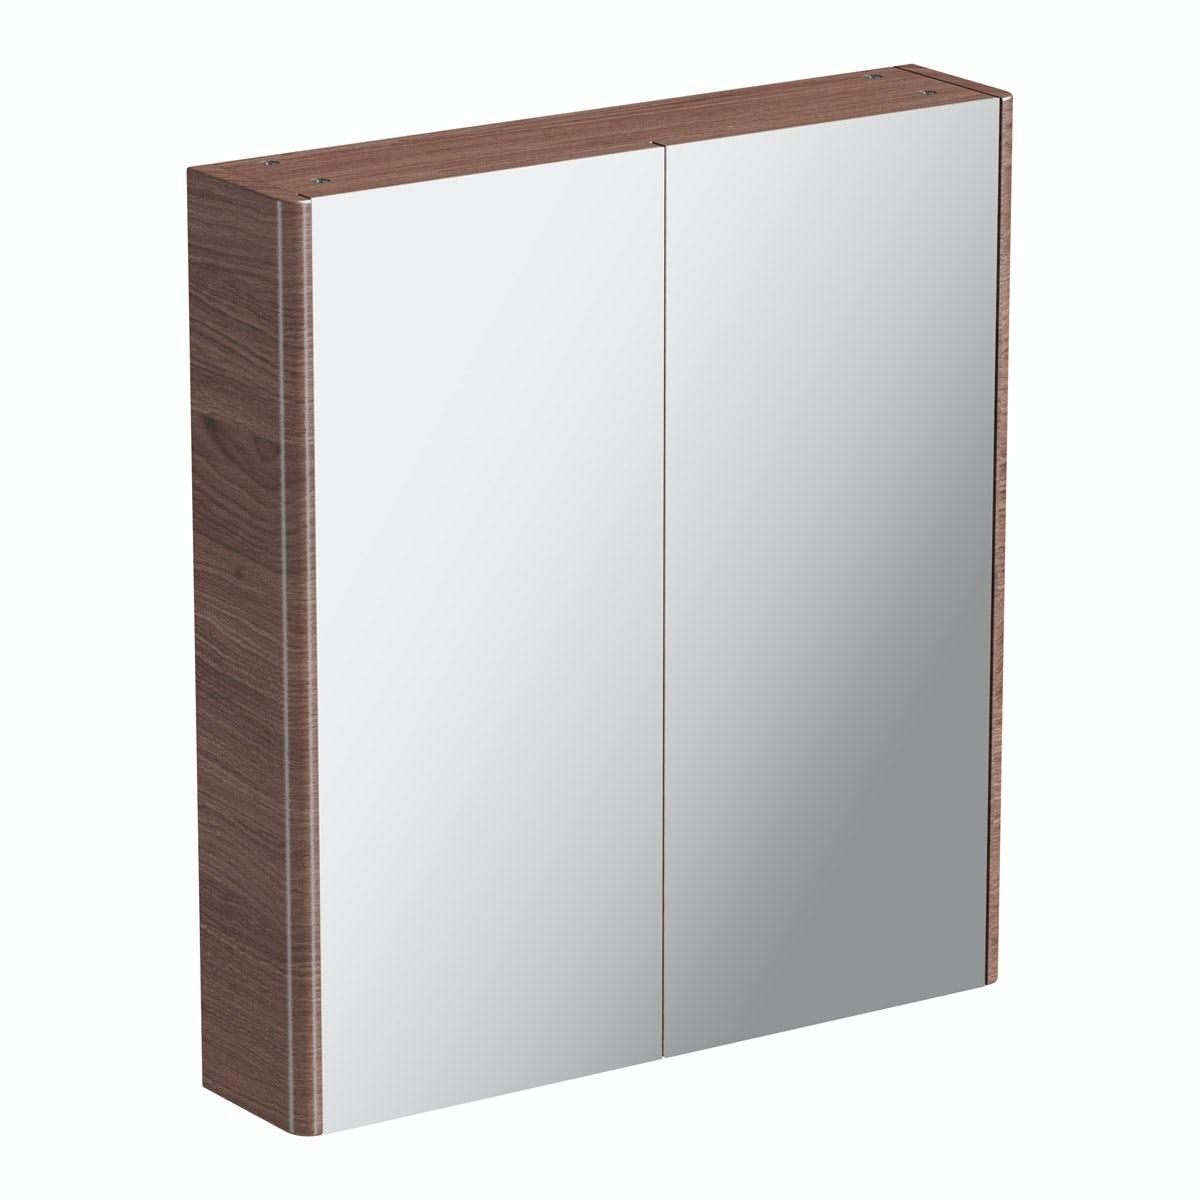 Mode Sherwood chestnut curved mirror cabinet 600mm